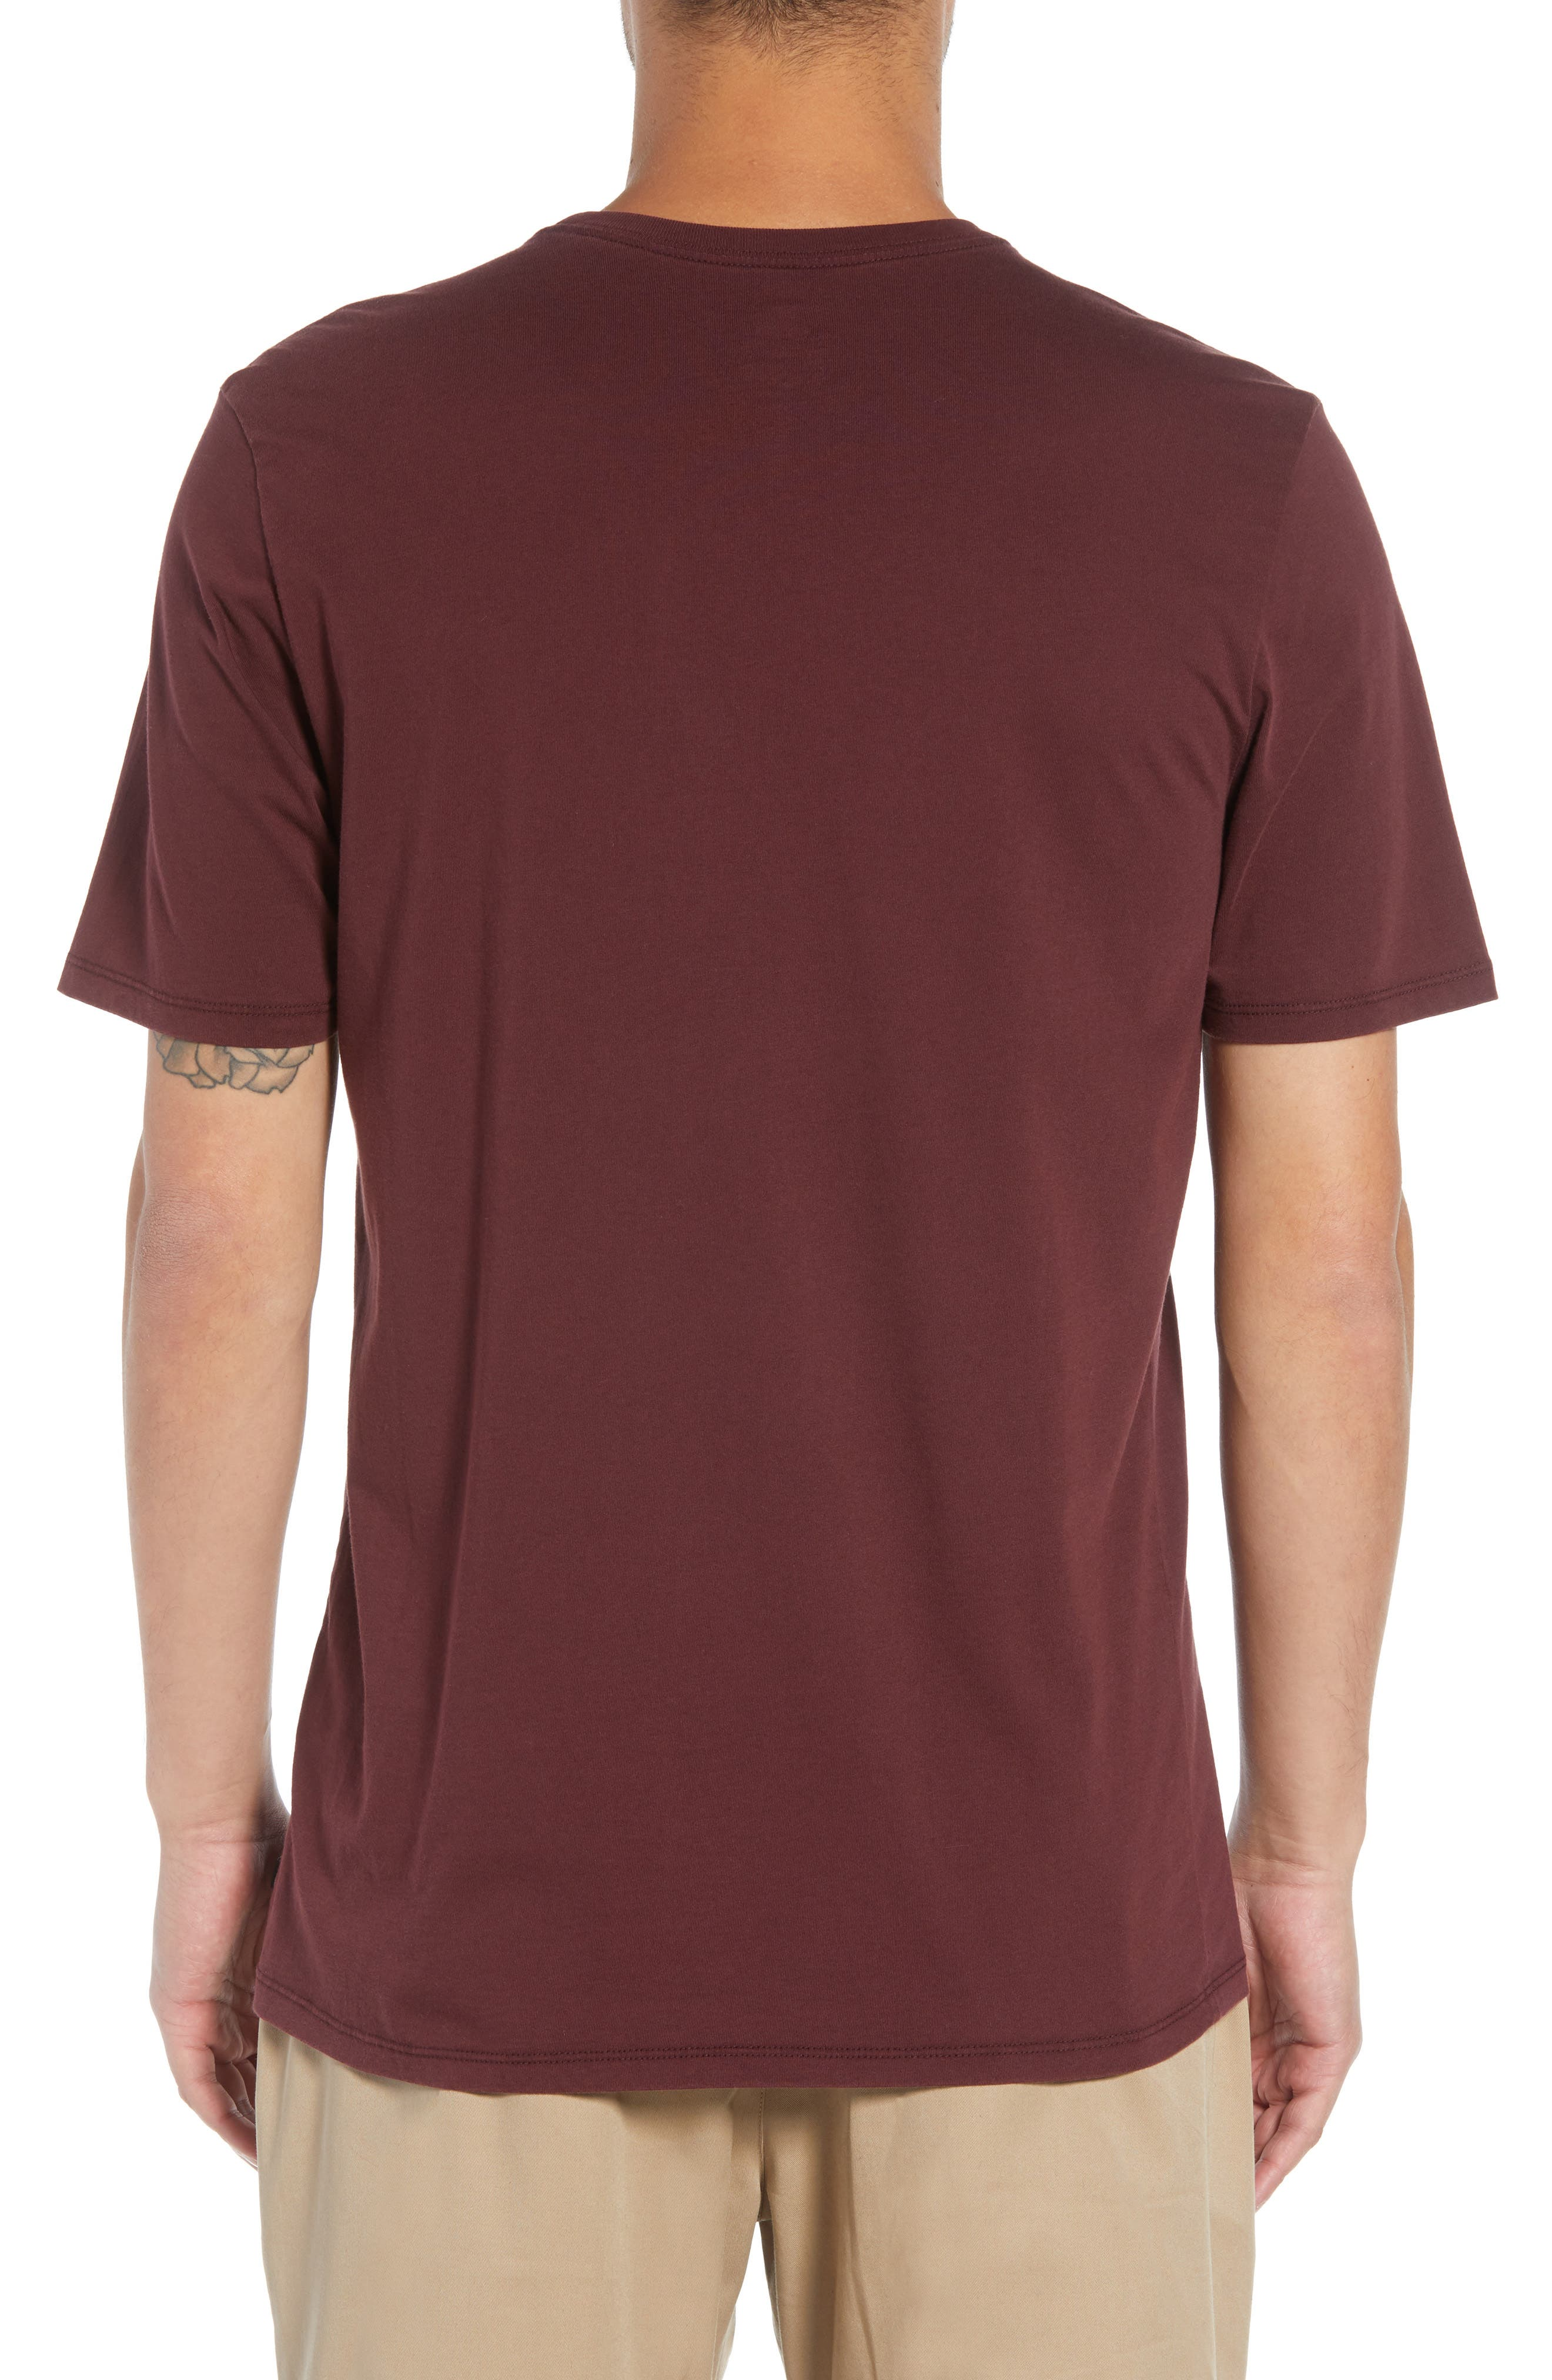 Crewneck T-Shirt,                             Alternate thumbnail 2, color,                             BURGUNDY CRUSH/ HABANERO RED